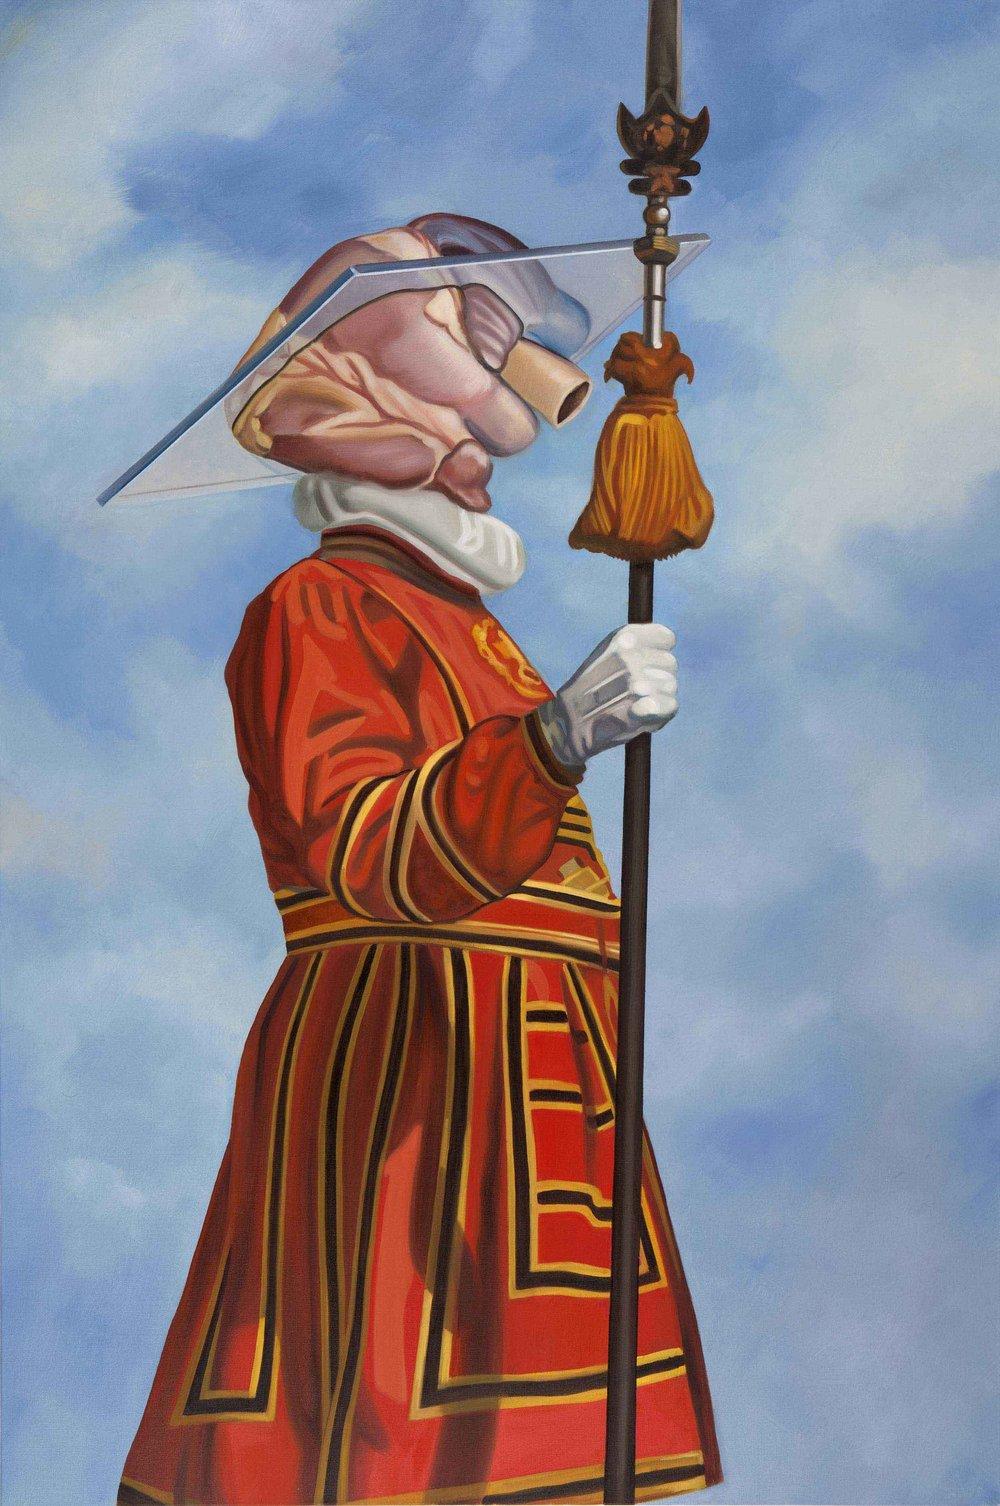 Interdimensional Guard , 2015. Oil on canvas, 150 x 100 cm.